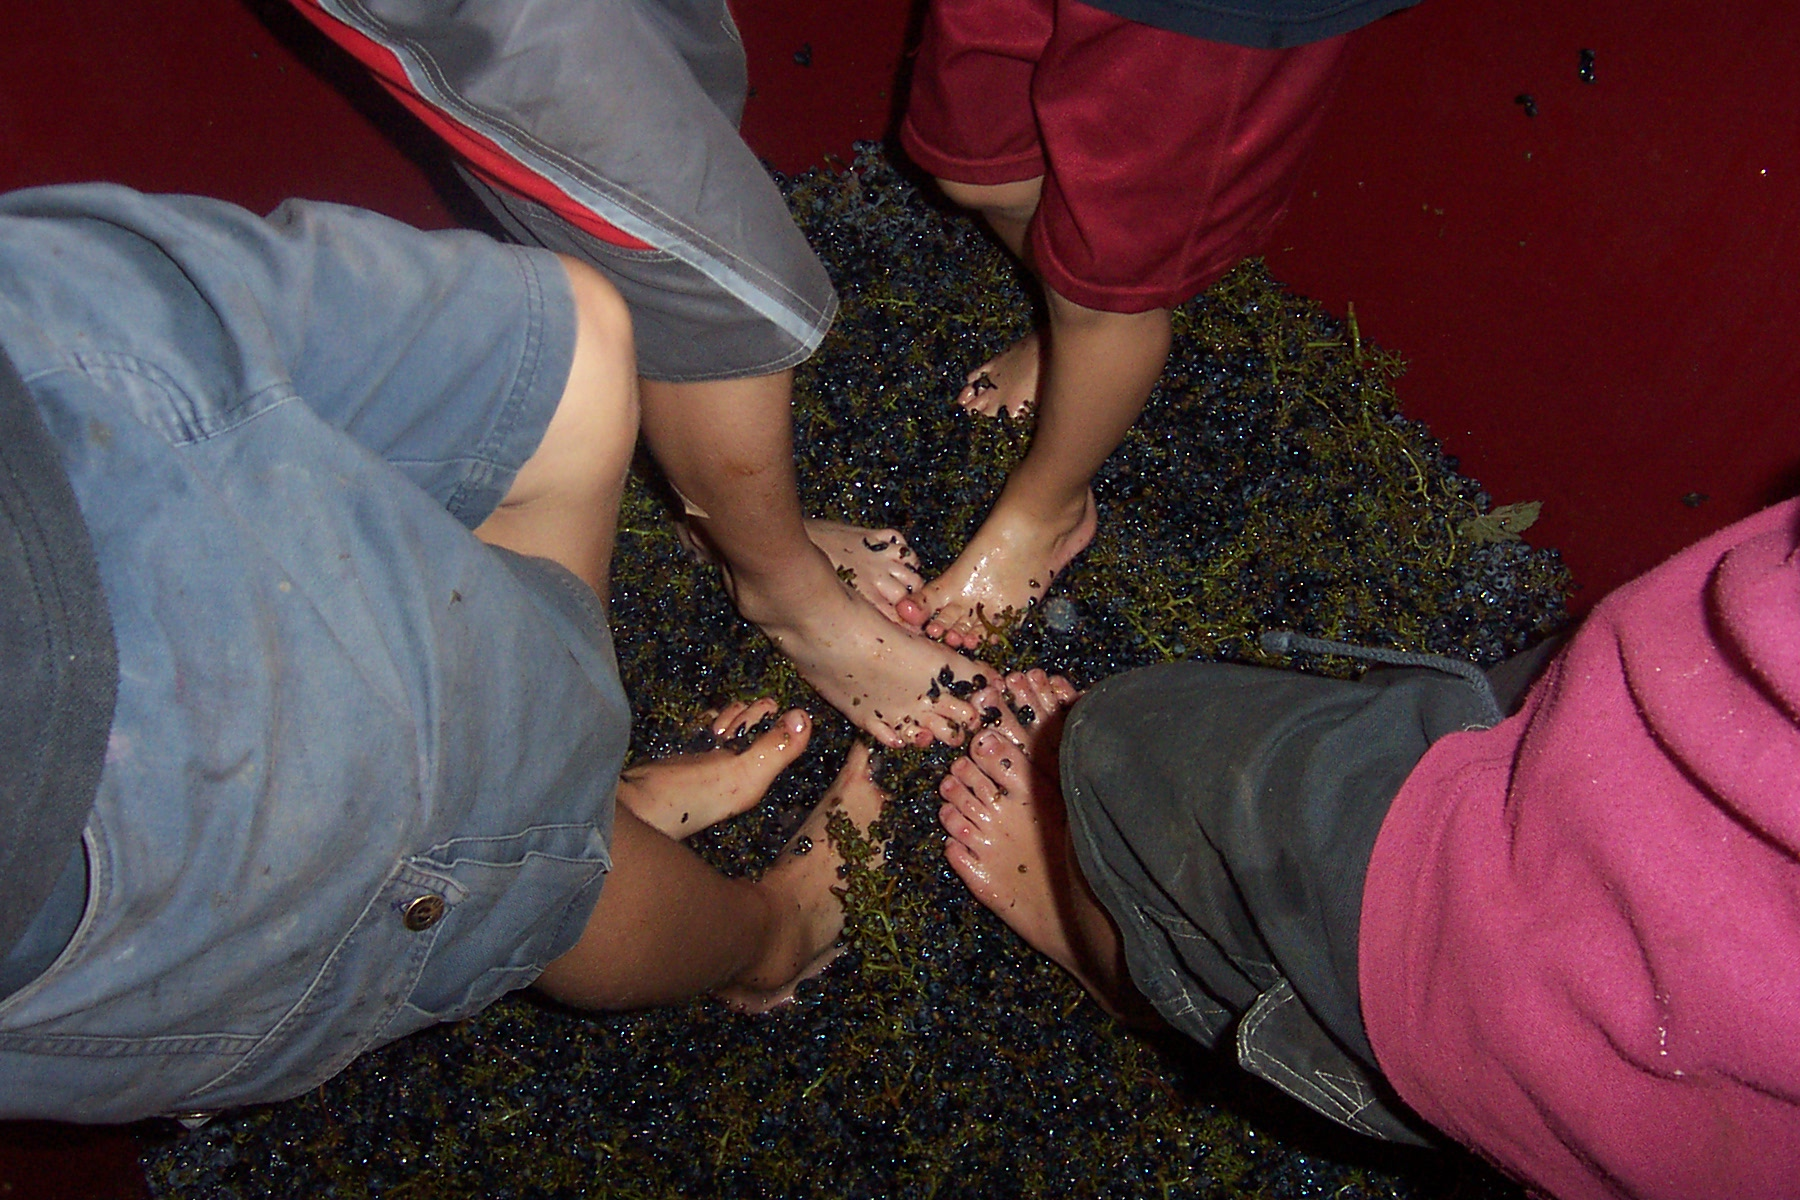 Winery kids foot stomp